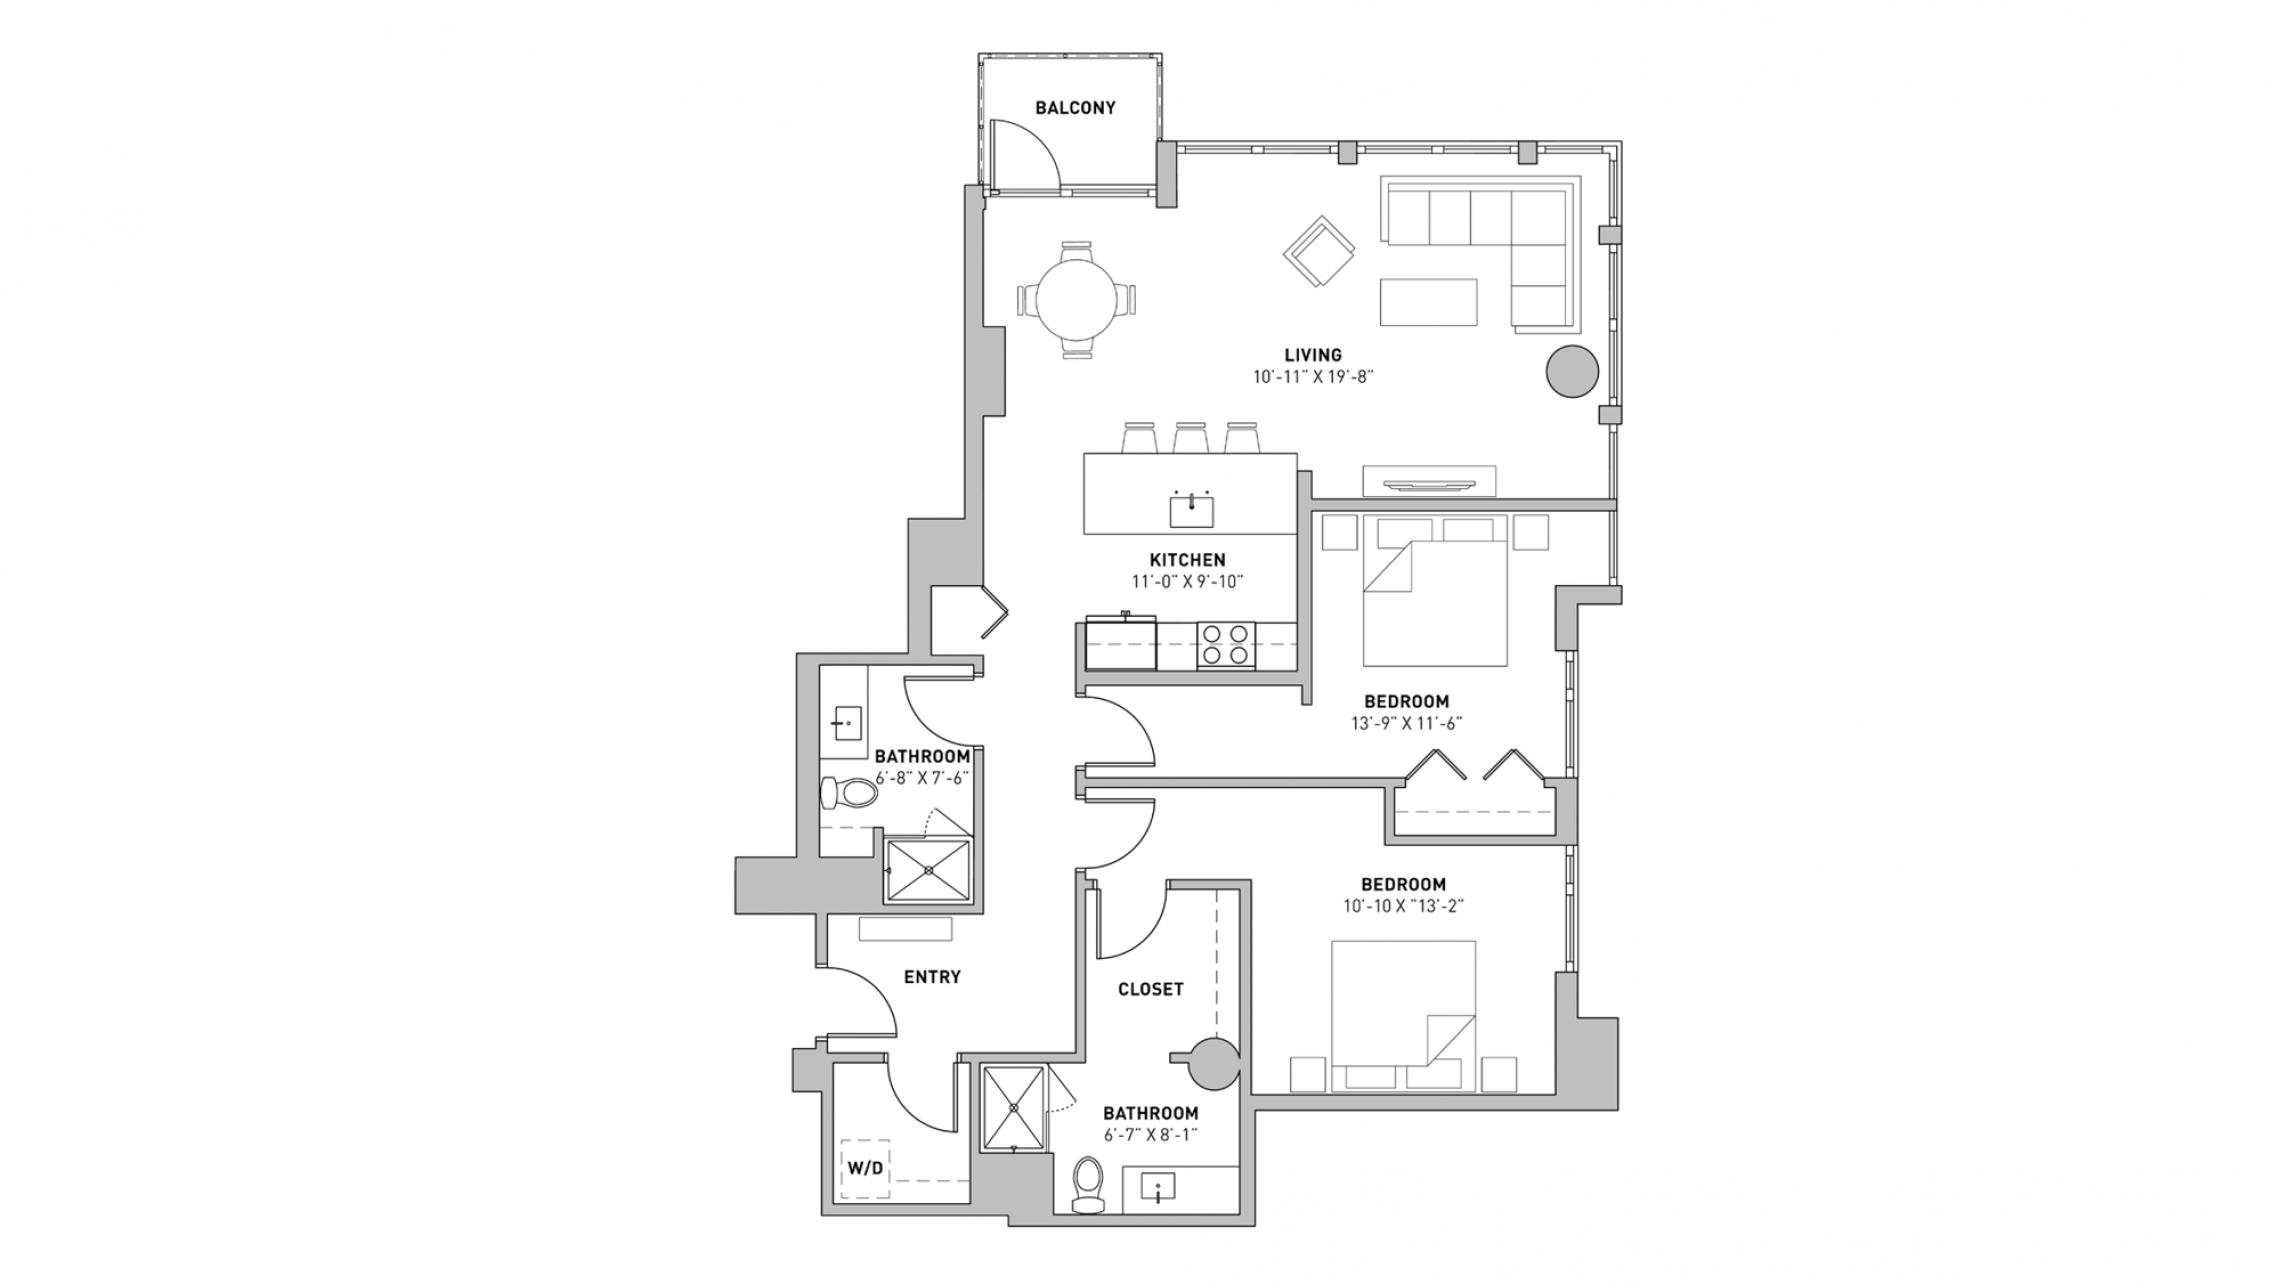 ULI The Pressman 307 - Two Bedroom, Two Bathroom